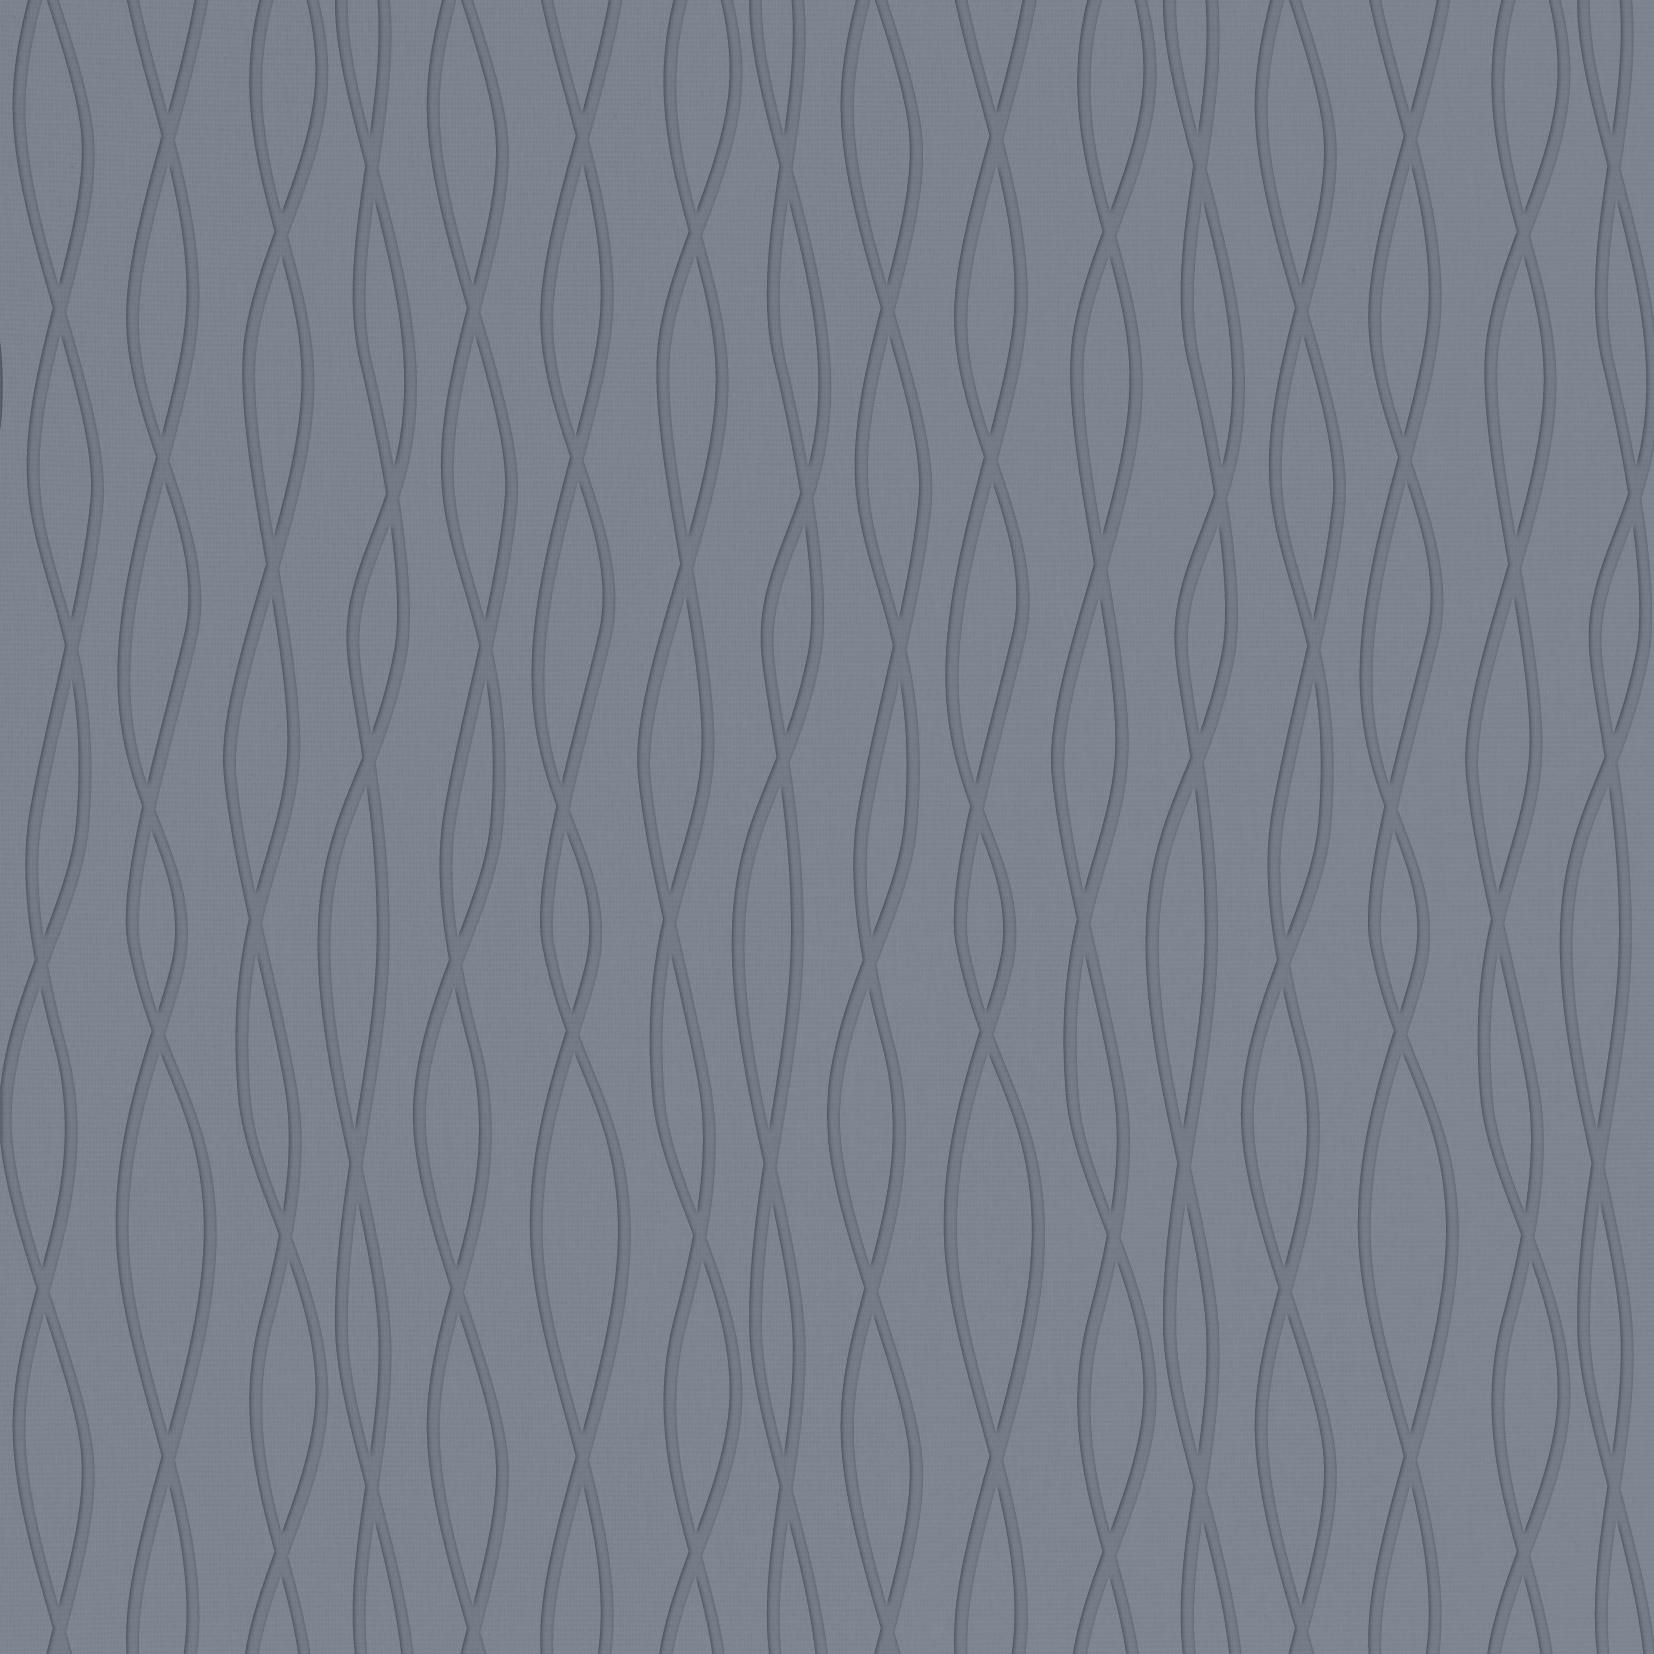 Vertical Blind Replacement Slats 89mm 3 5 Aria Design